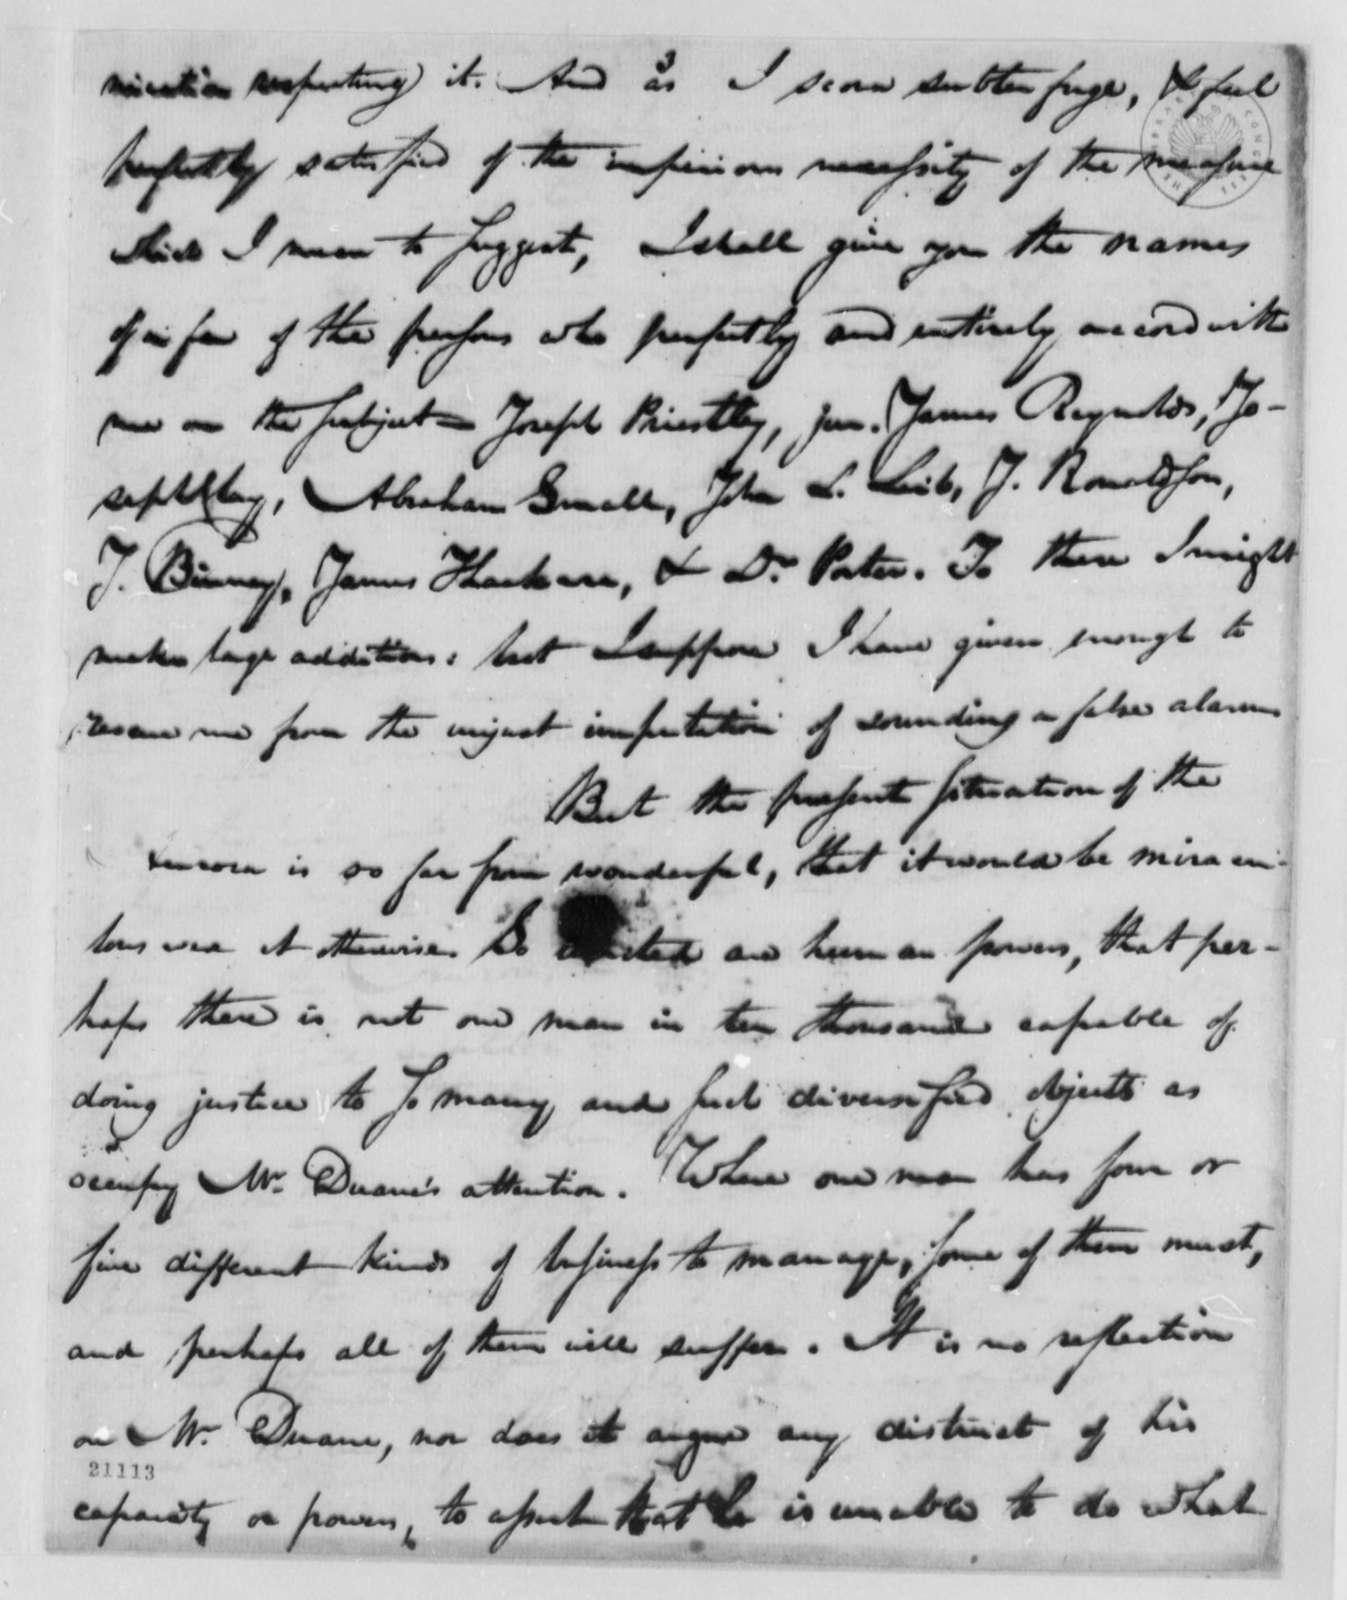 Matthew Carey to Thomas Jefferson, April 24, 1802